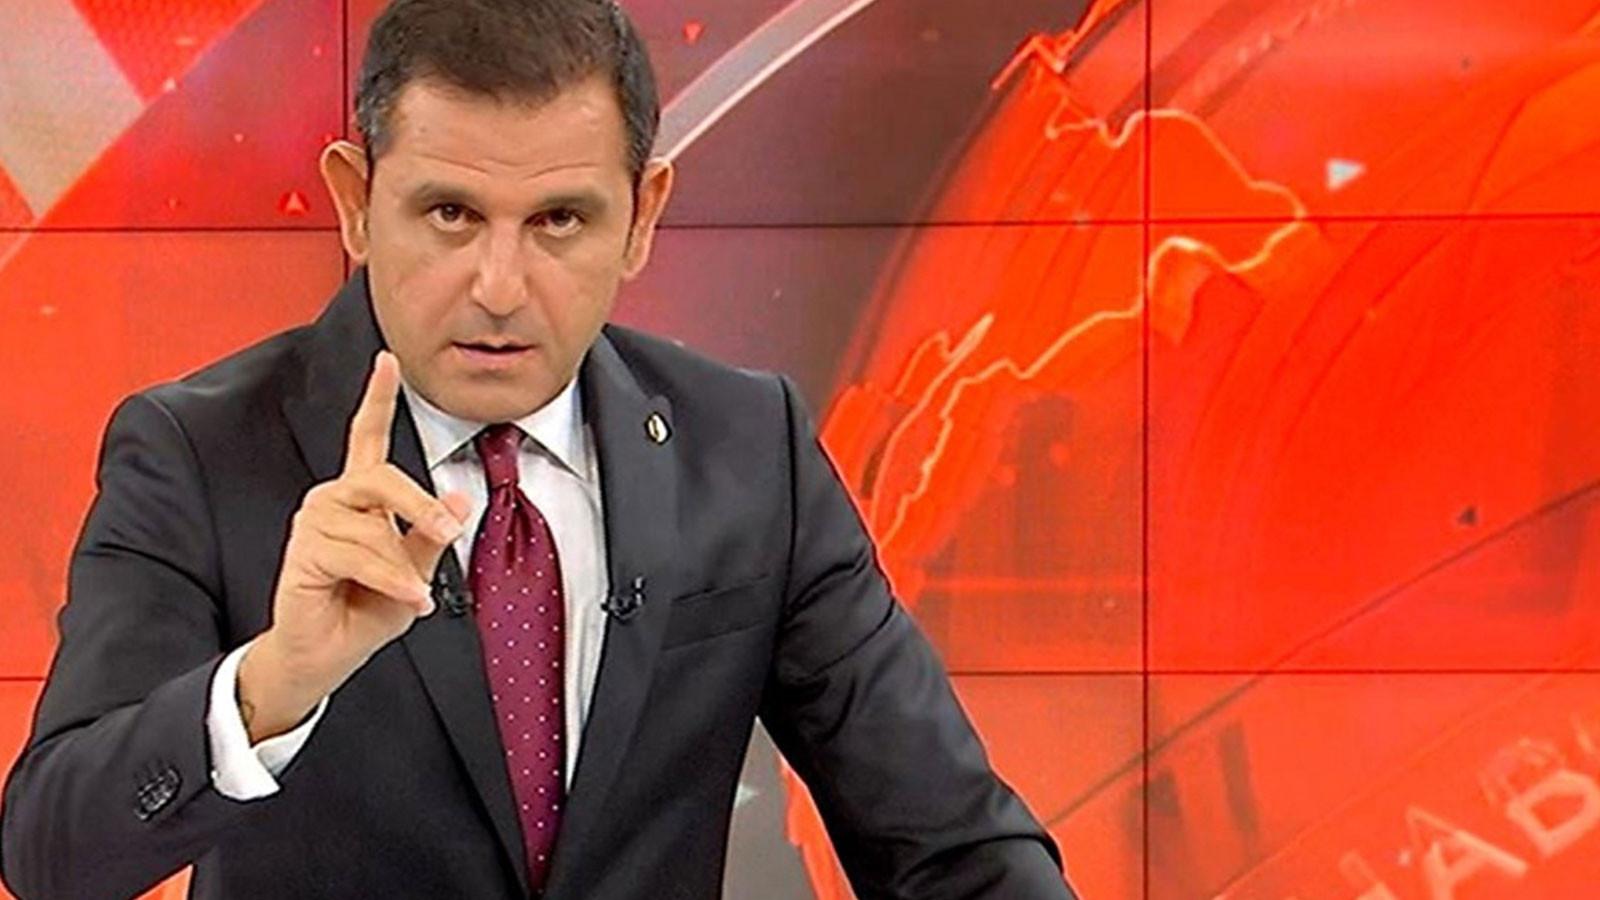 Fatih Portakal'dan Burhan Kuzu'ya emeklilik mesajı